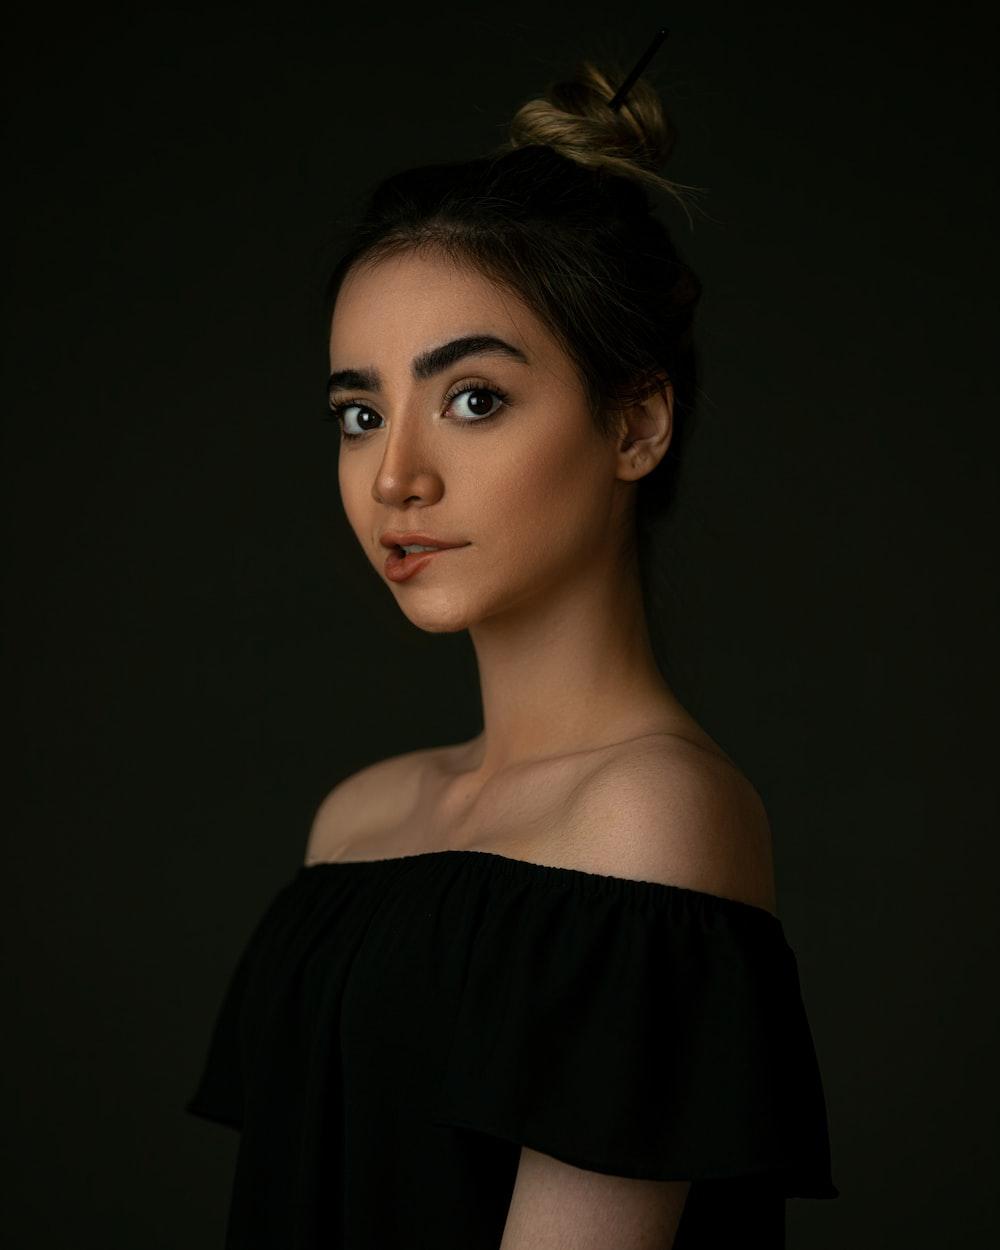 woman in black off shoulder top